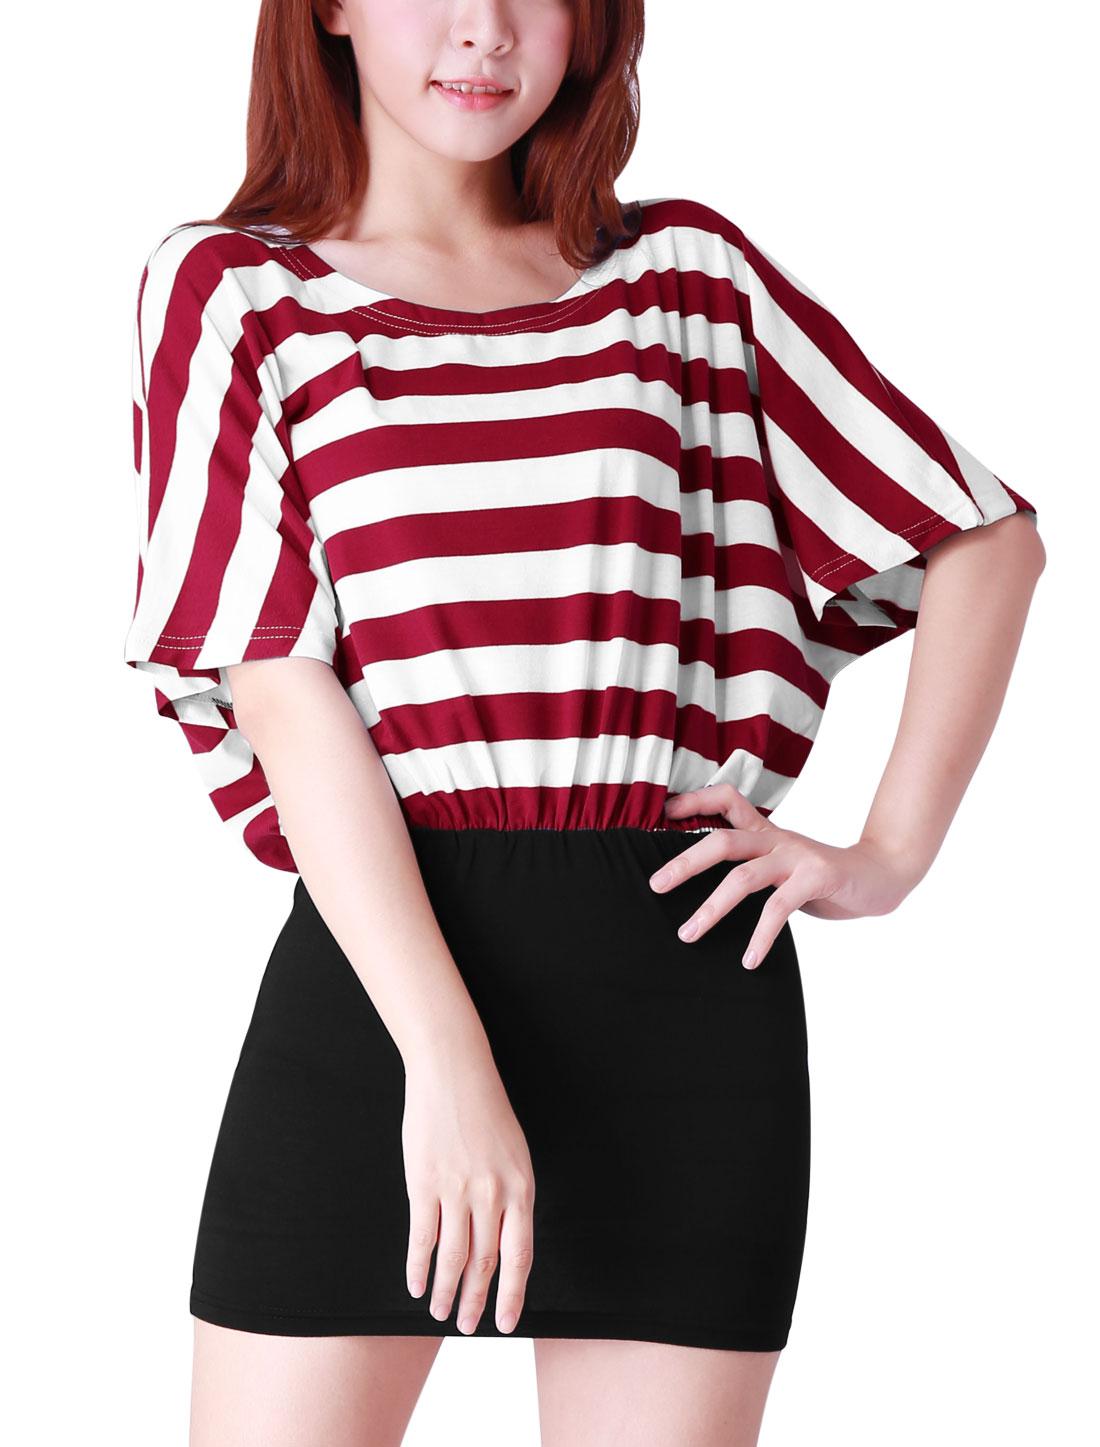 Chic Warm Red Striped Upper Black Splice Causal Mini Dress for Lady L